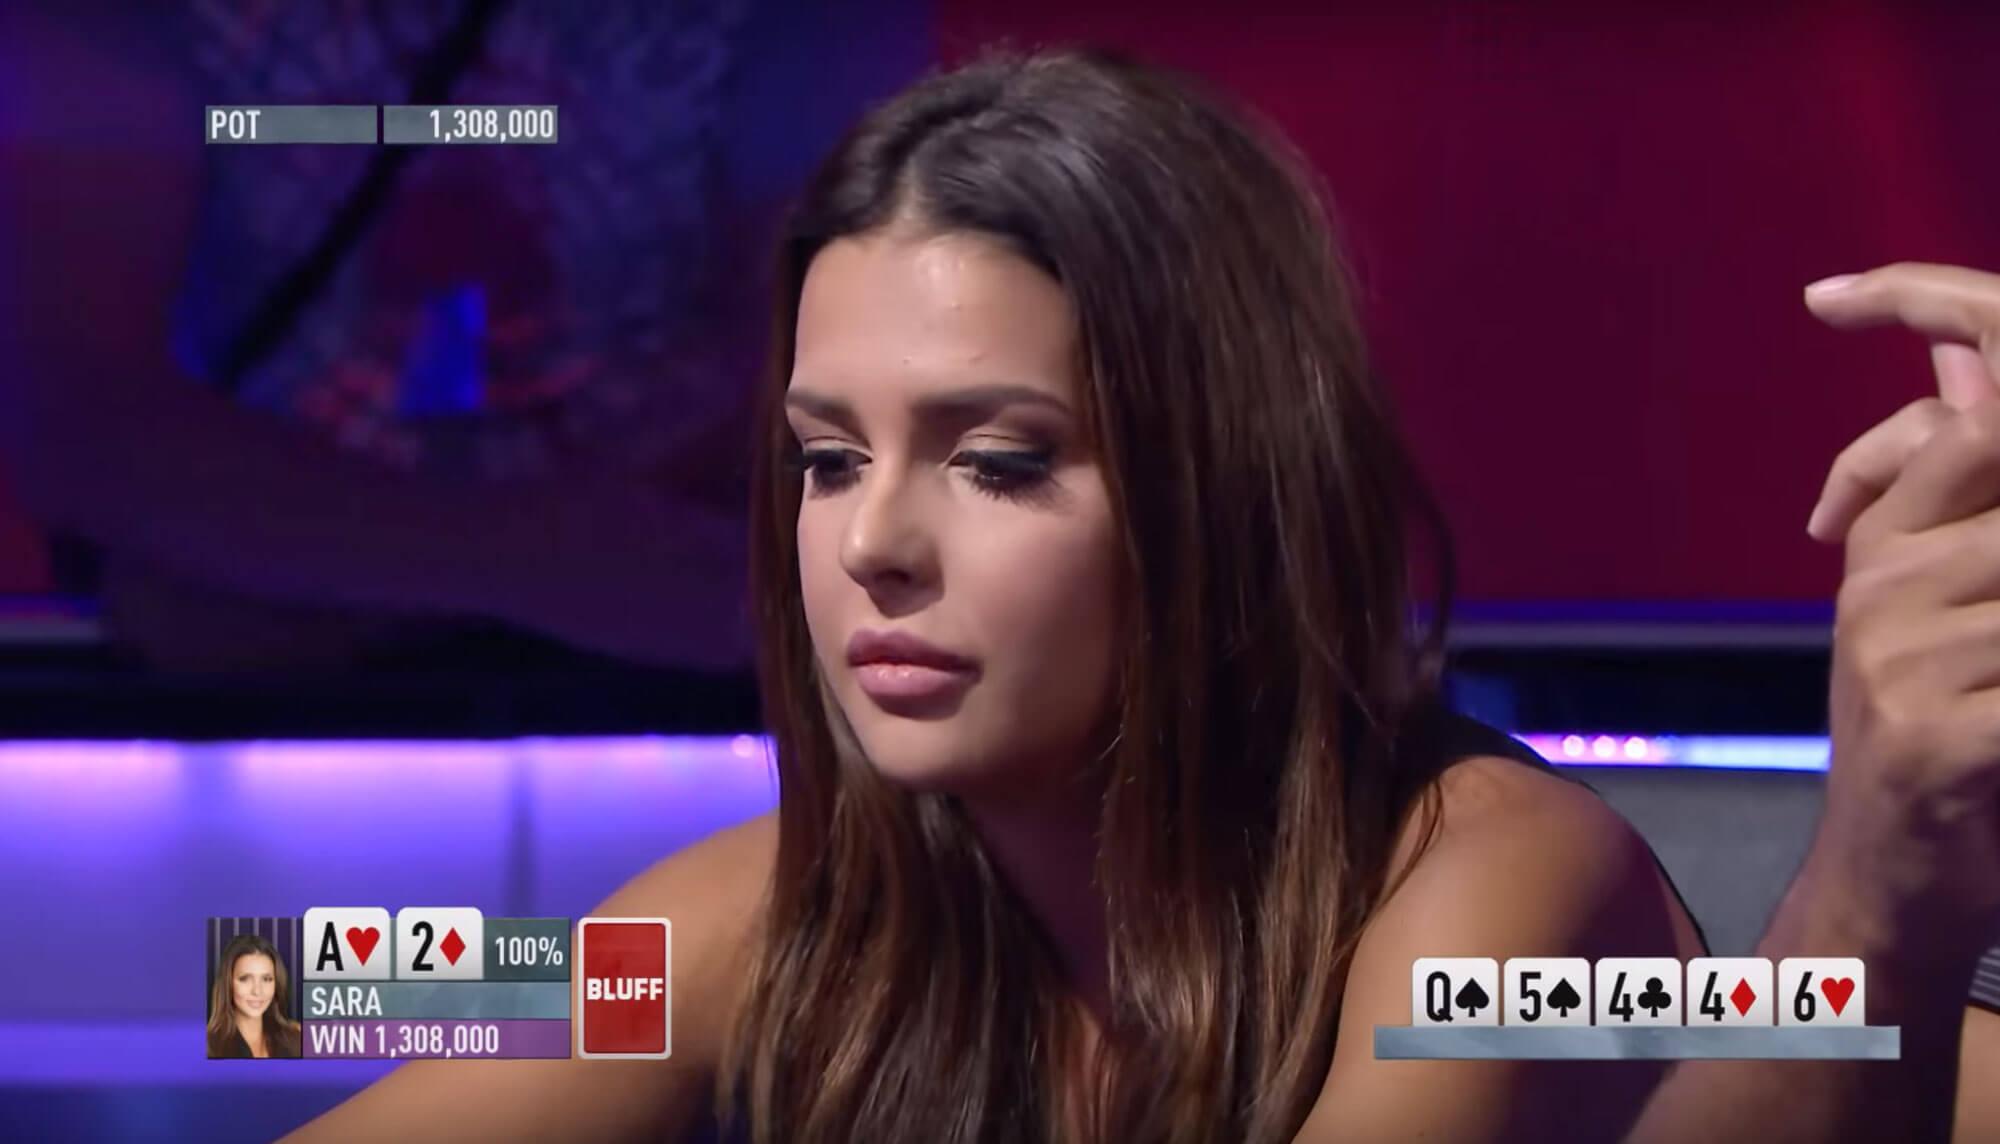 Poker Heads Up Blinds